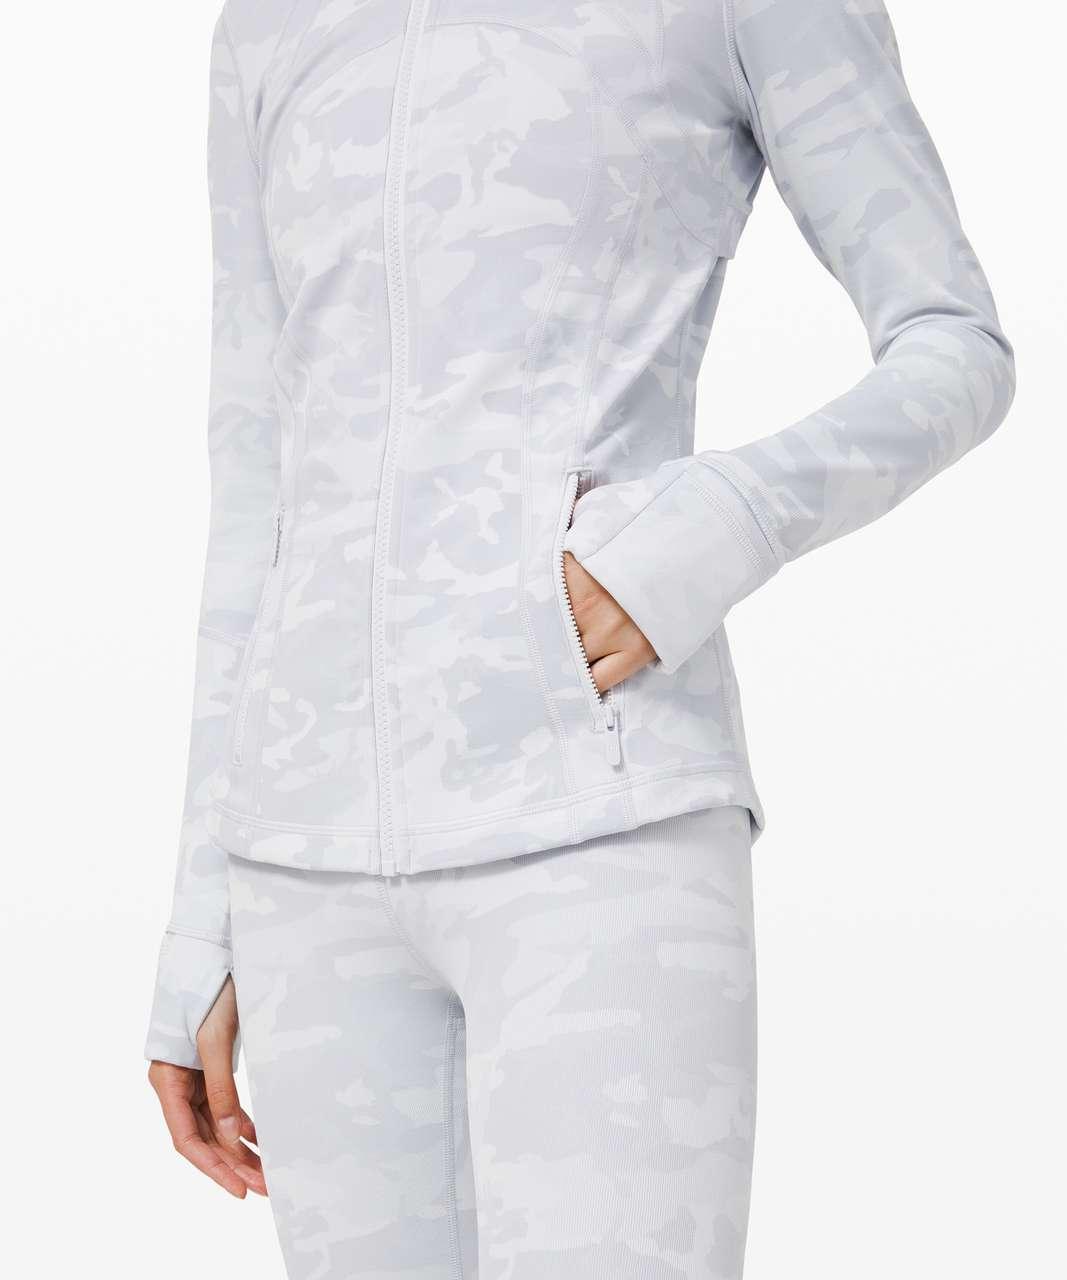 Lululemon Define Jacket *Luxtreme - Incognito Camo Jacquard Alpine White Starlight